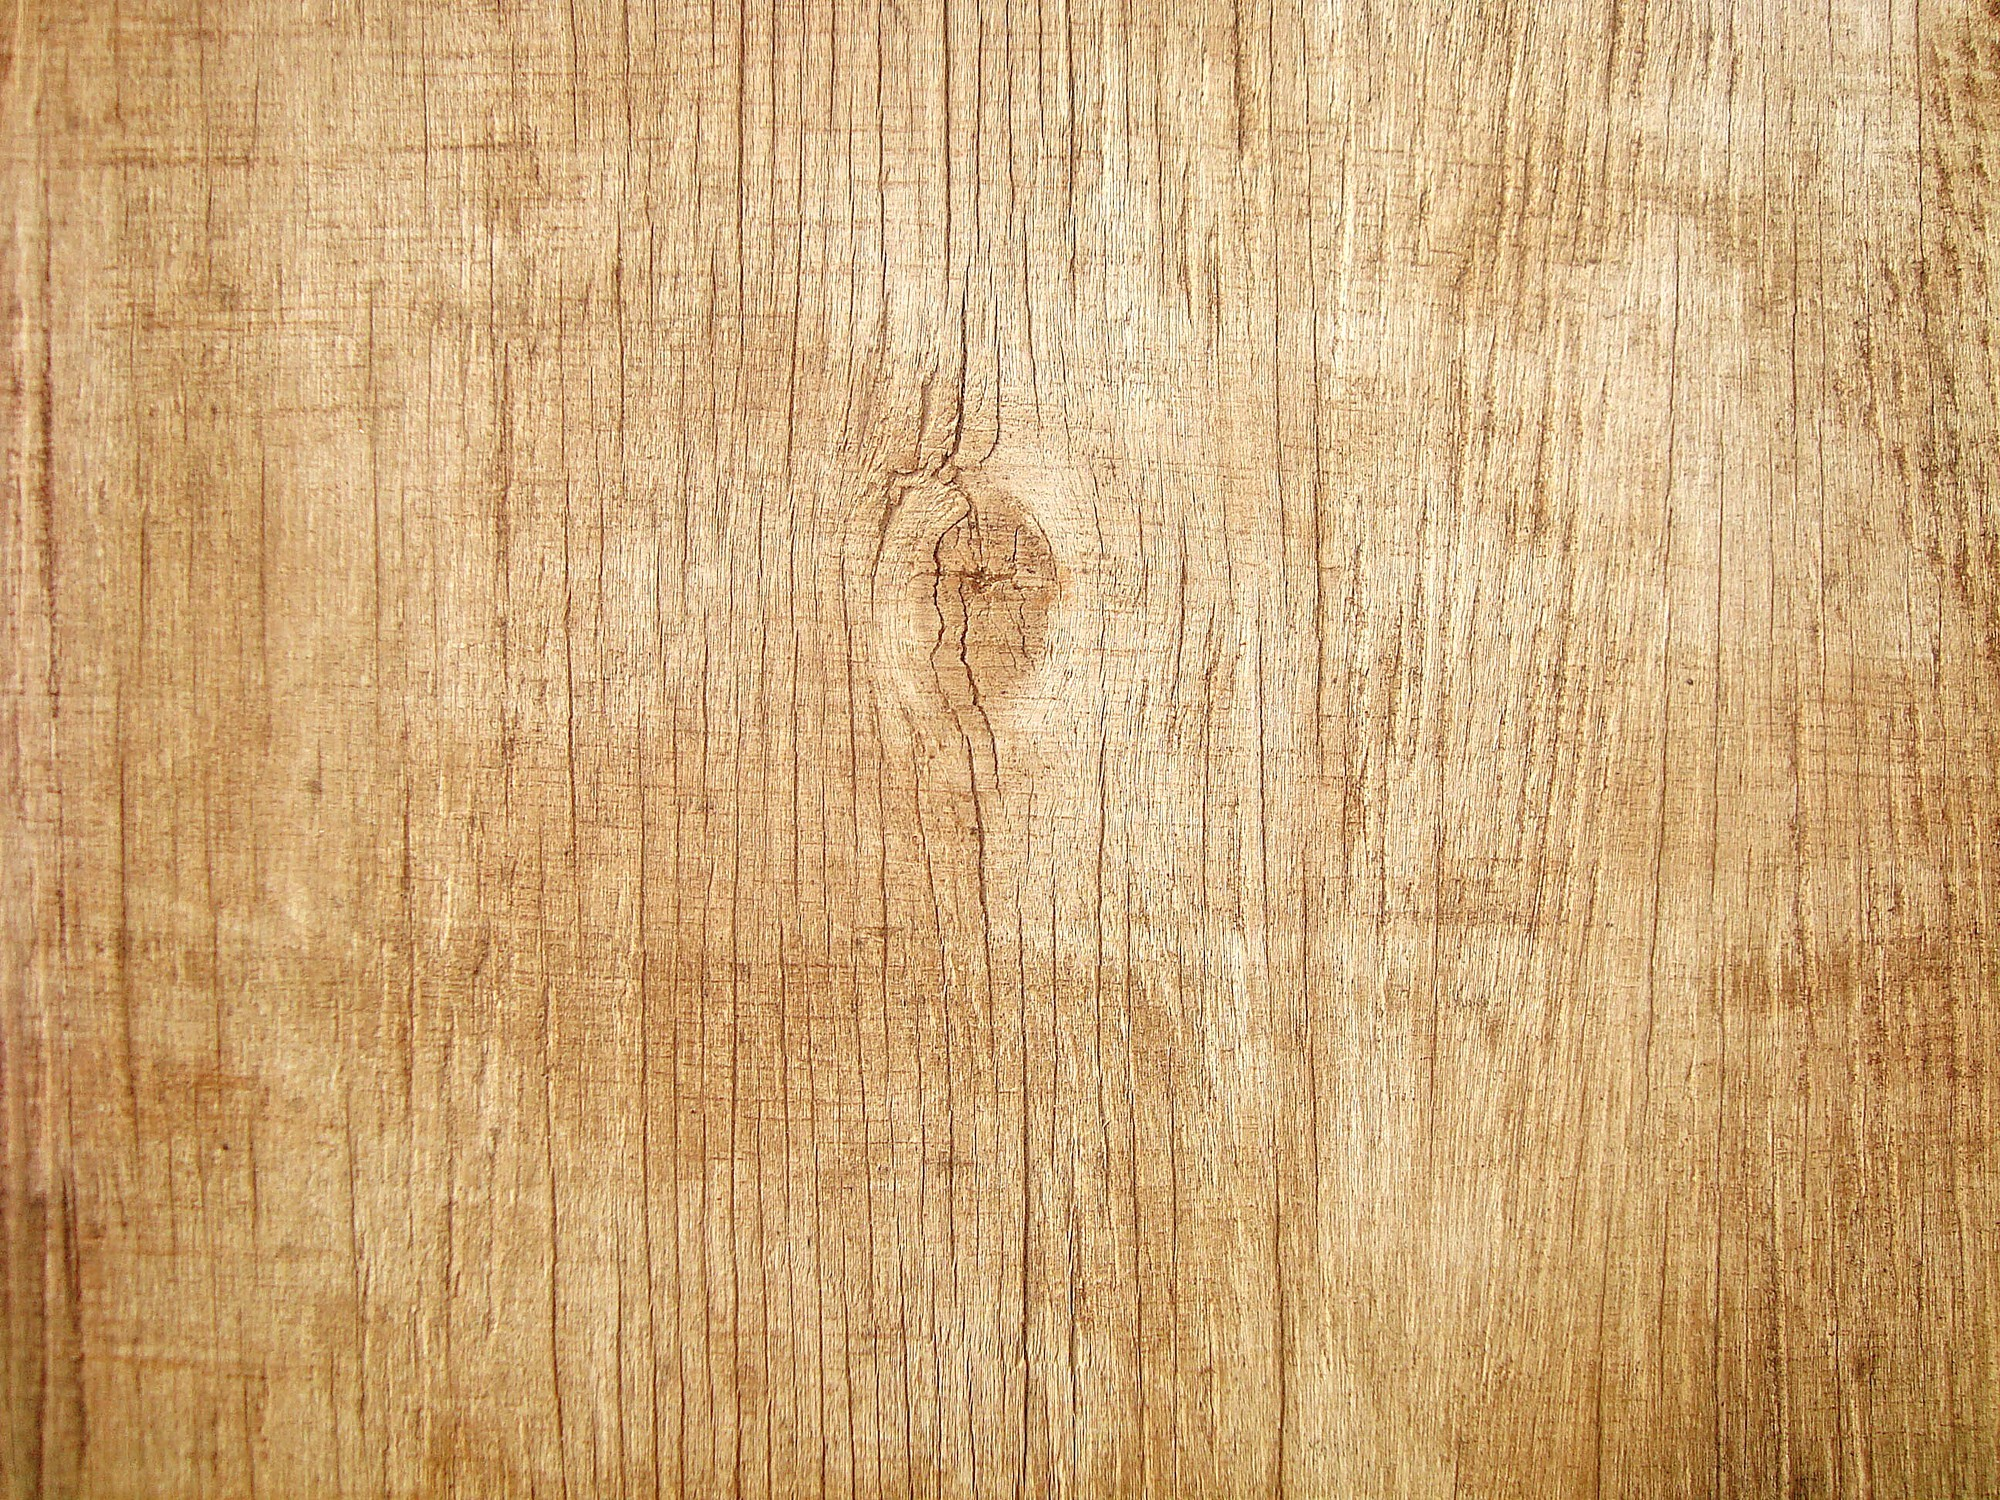 Wood Grain Desktop Wallpaper 51 Images